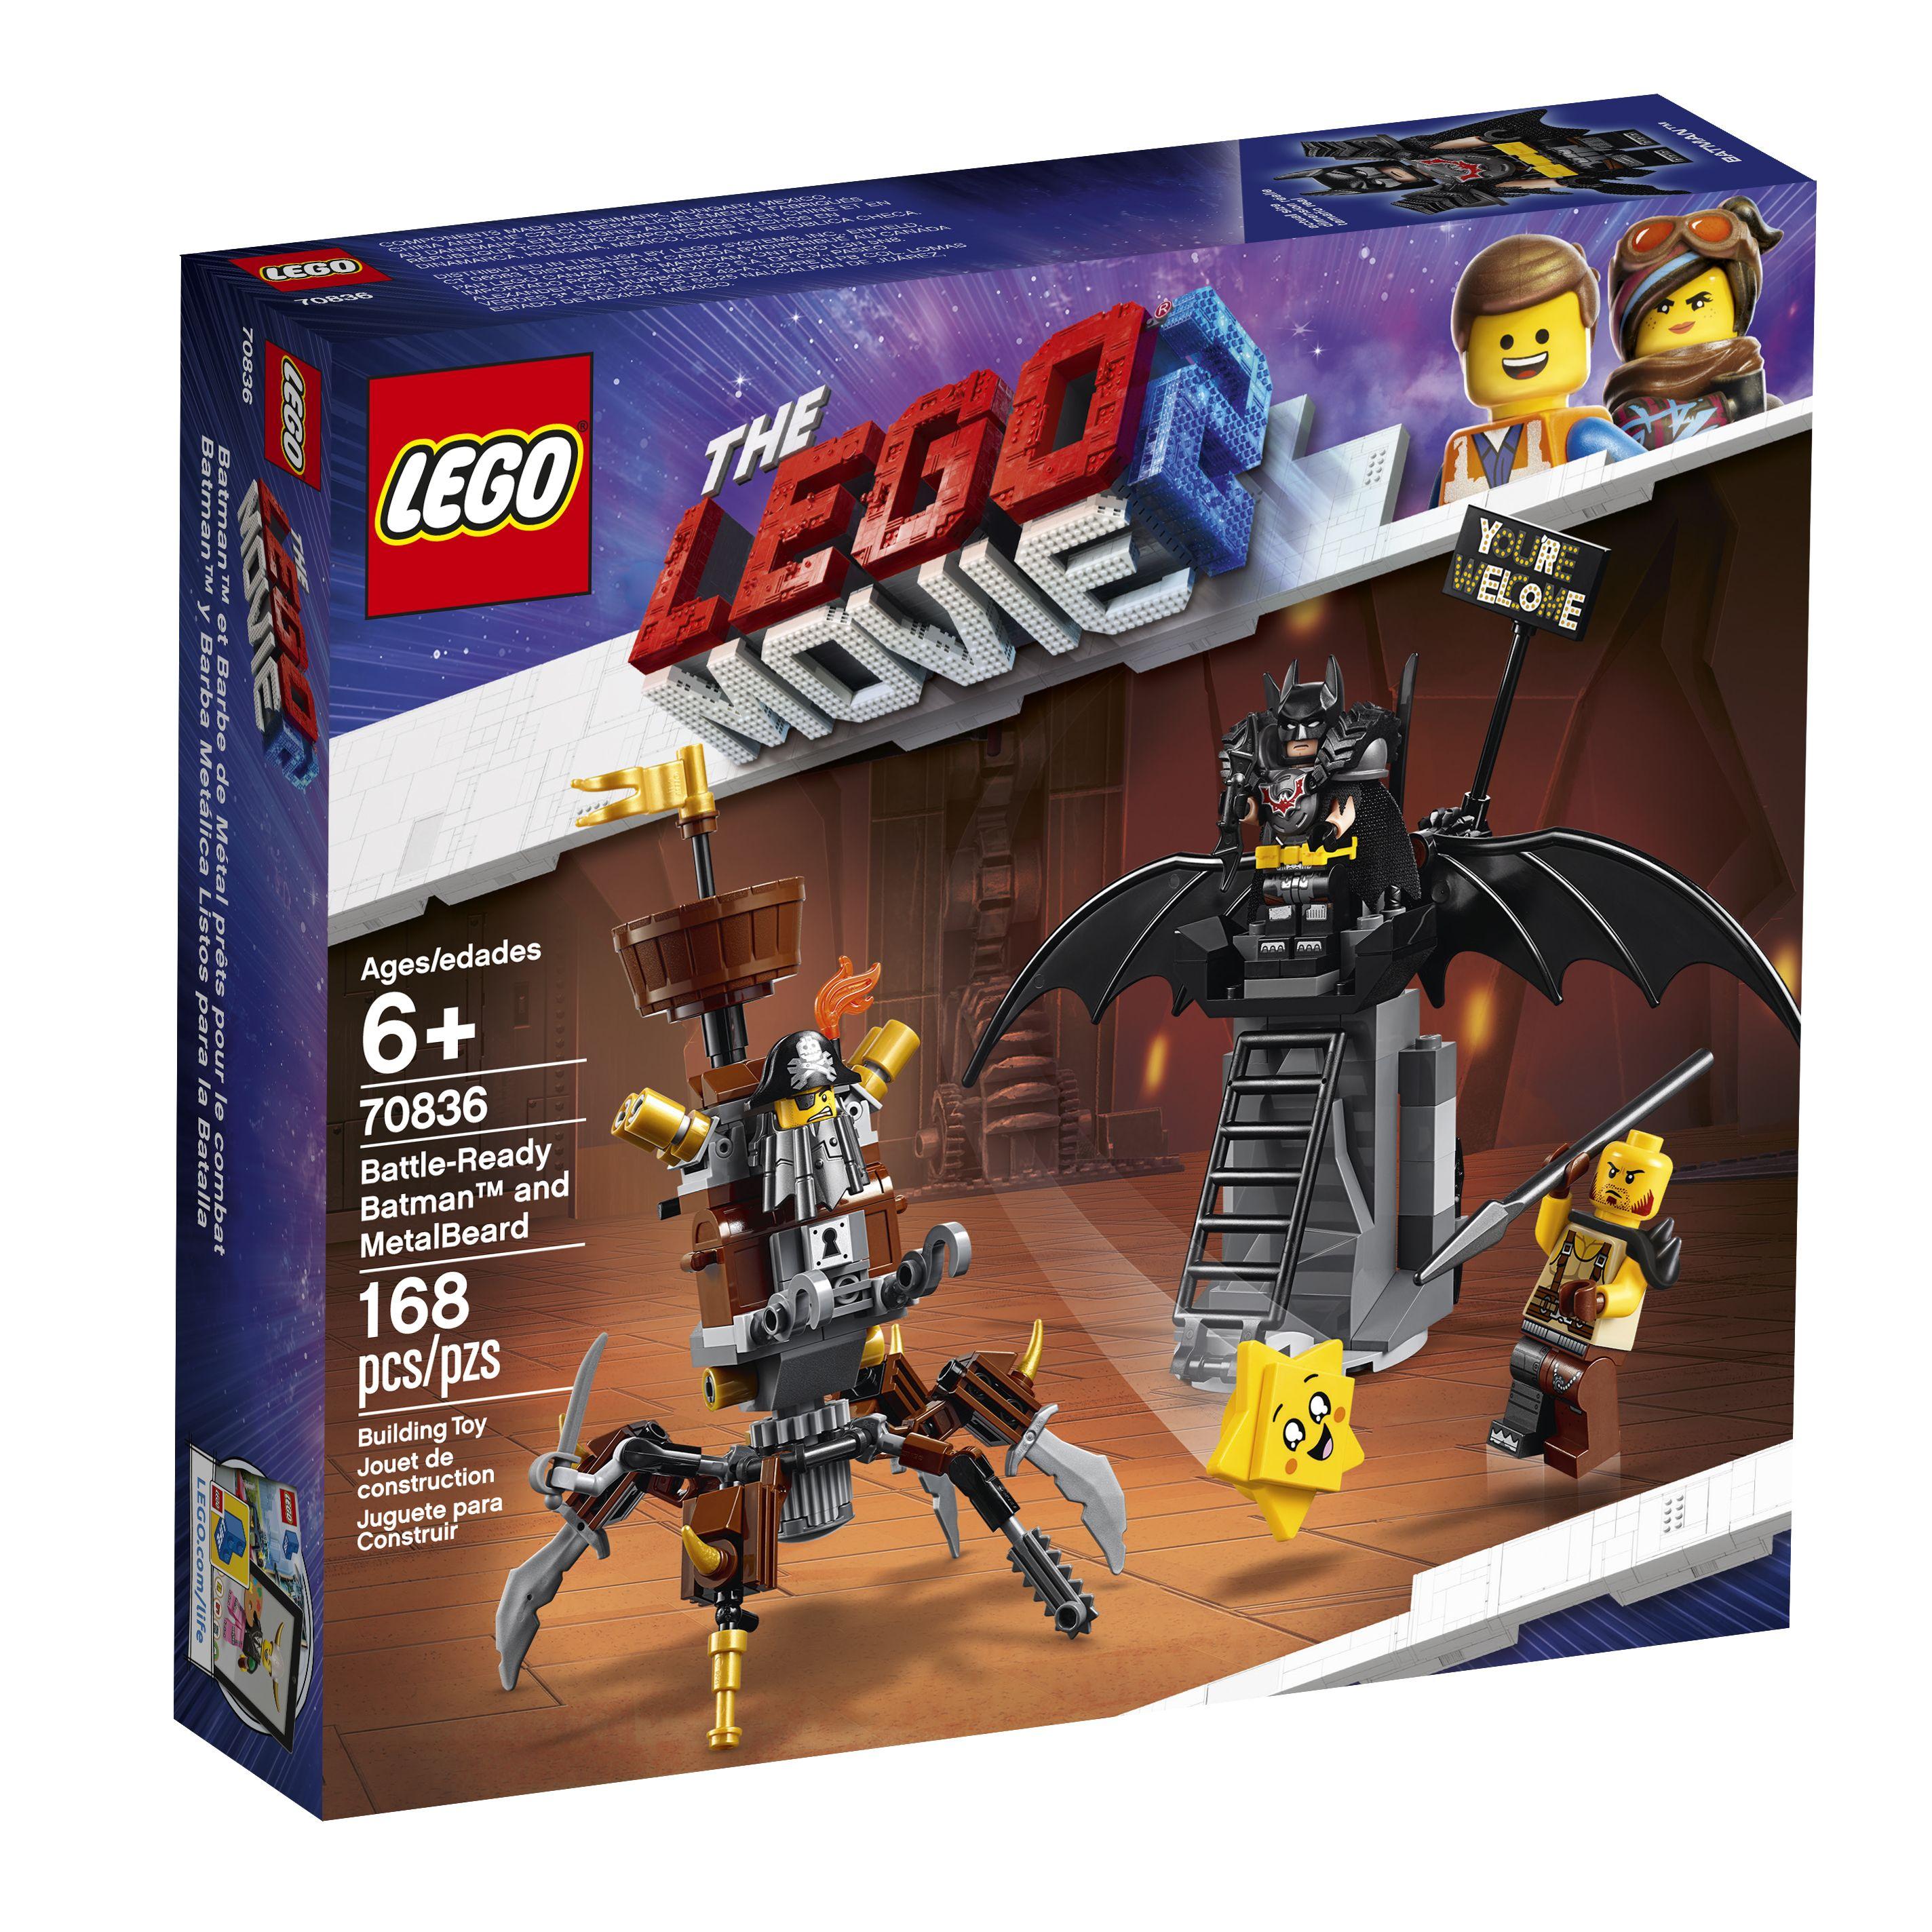 The Batman Universe – LEGO Batman Set Revealed for The ... Lego Batman 2 Sets